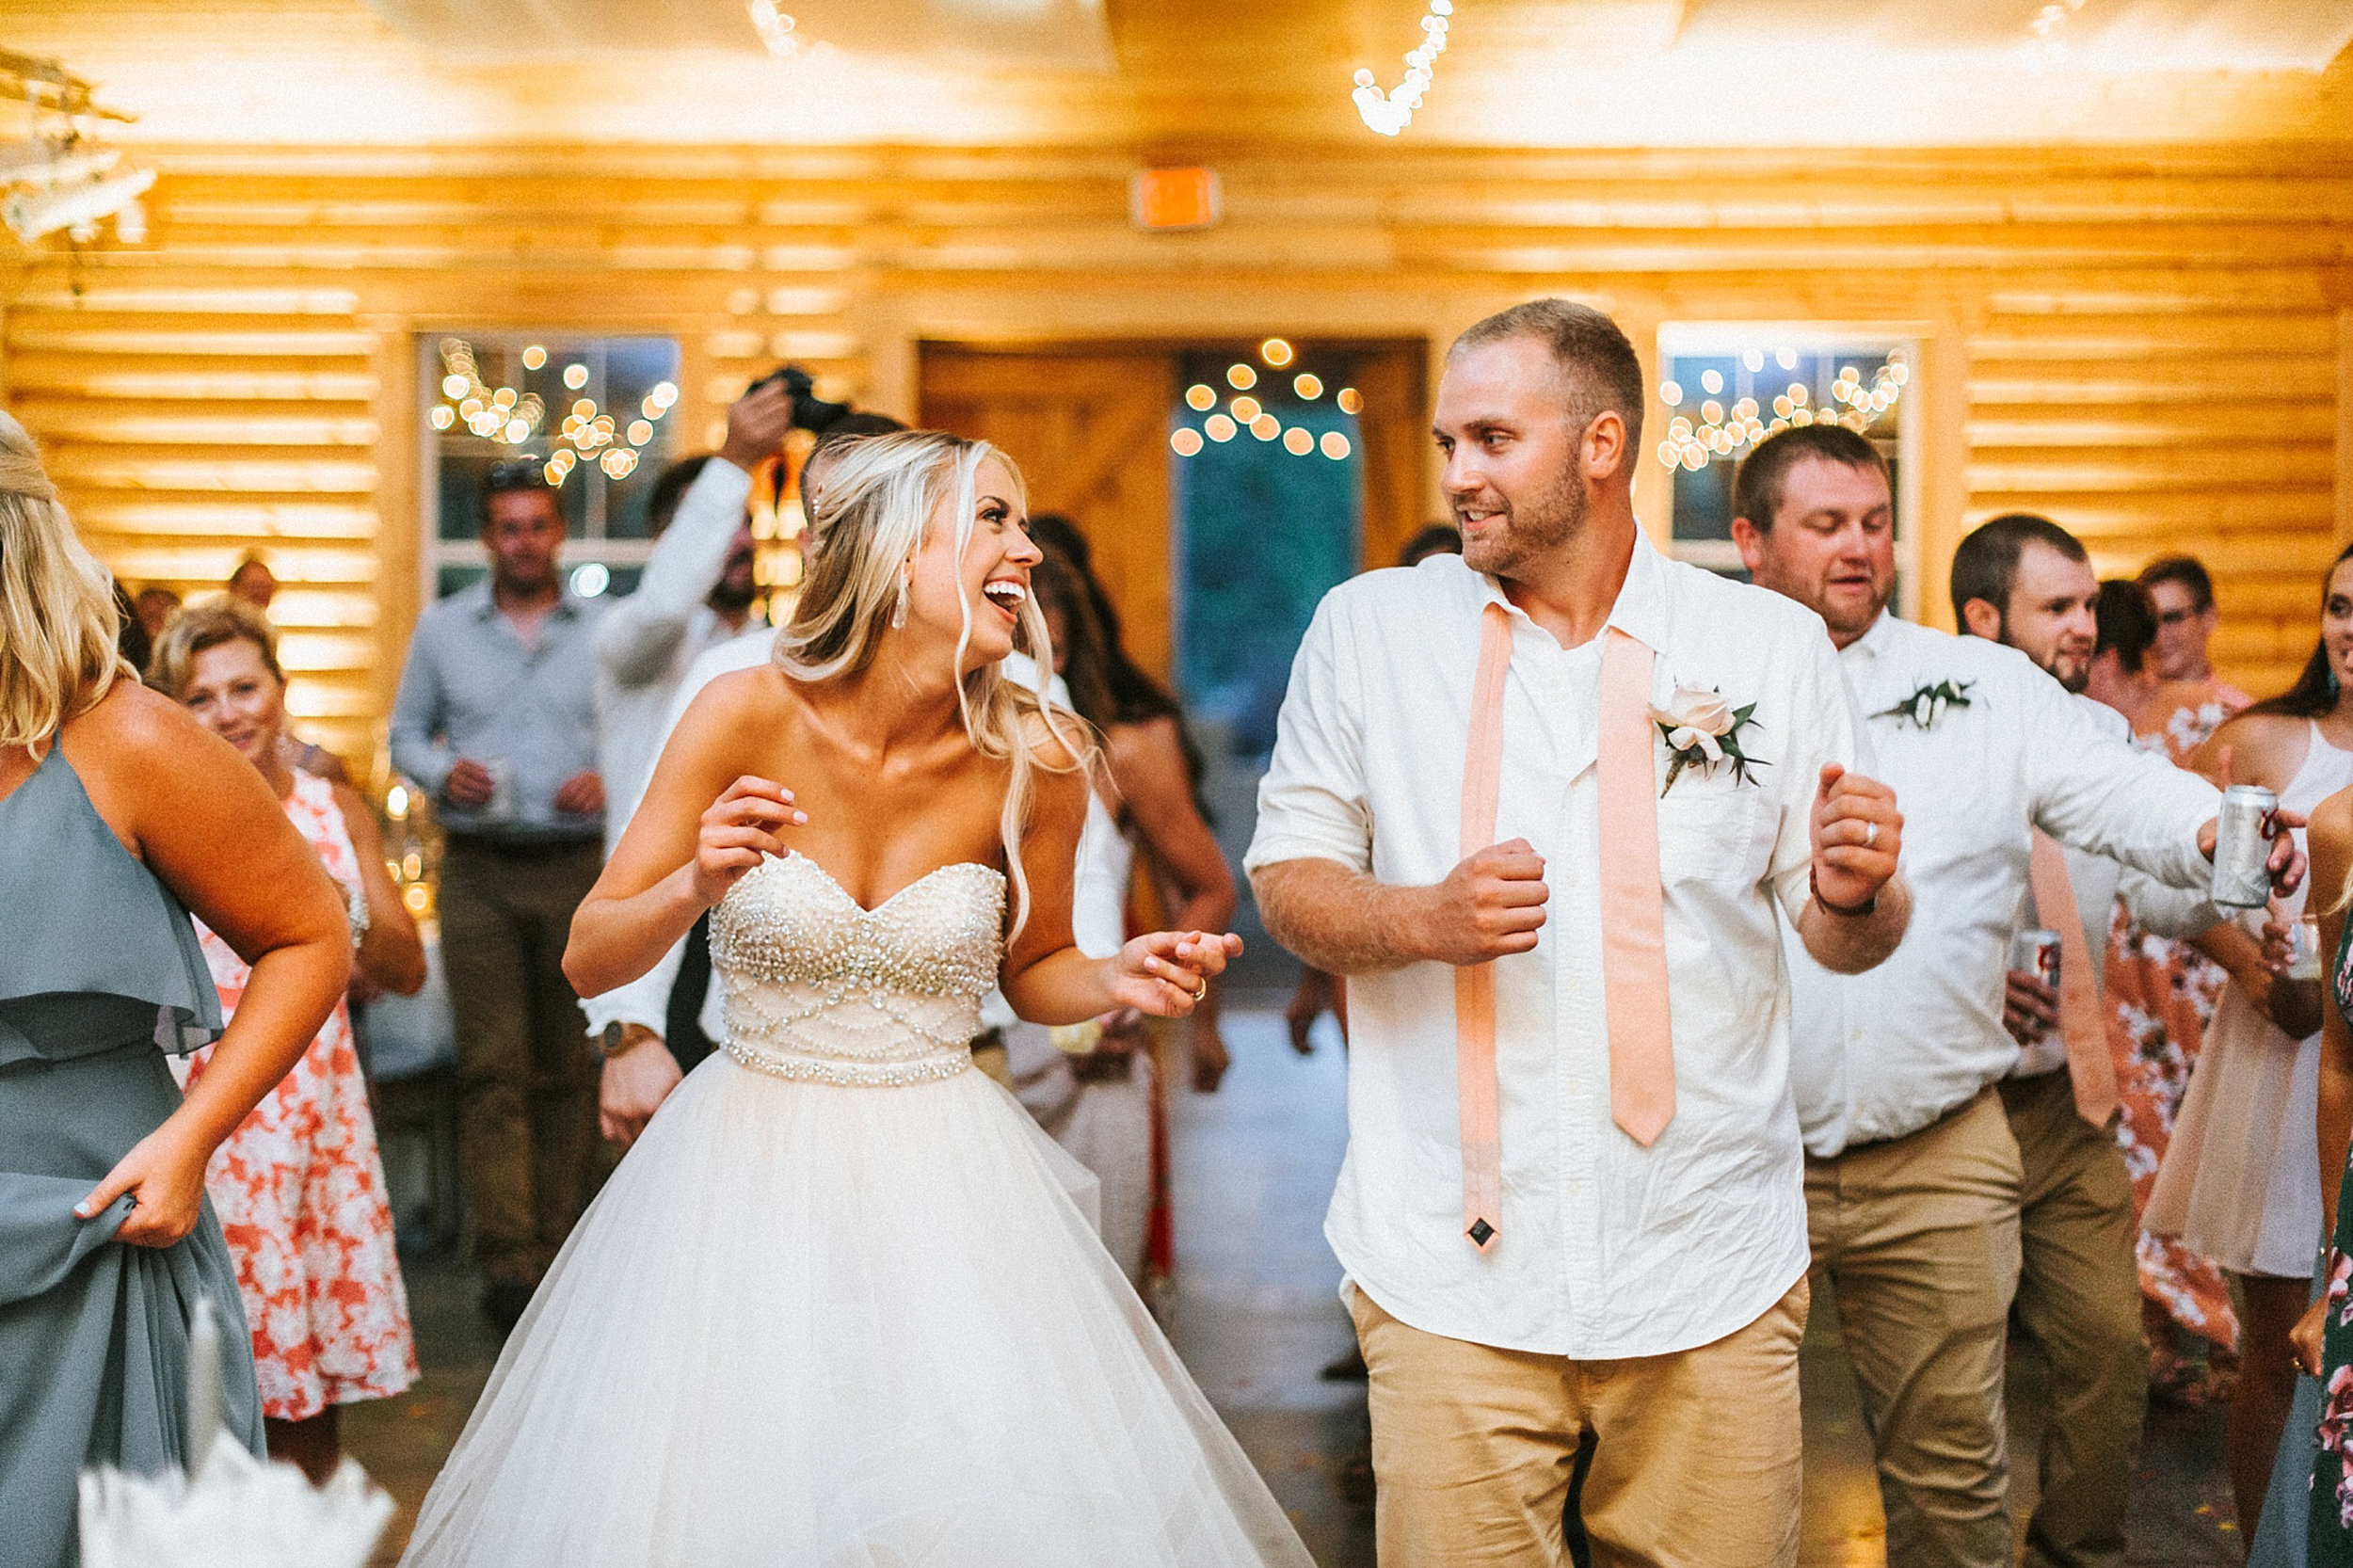 Brooke Townsend Photography - Cincinnati Wedding Photographer (149 of 153).jpg